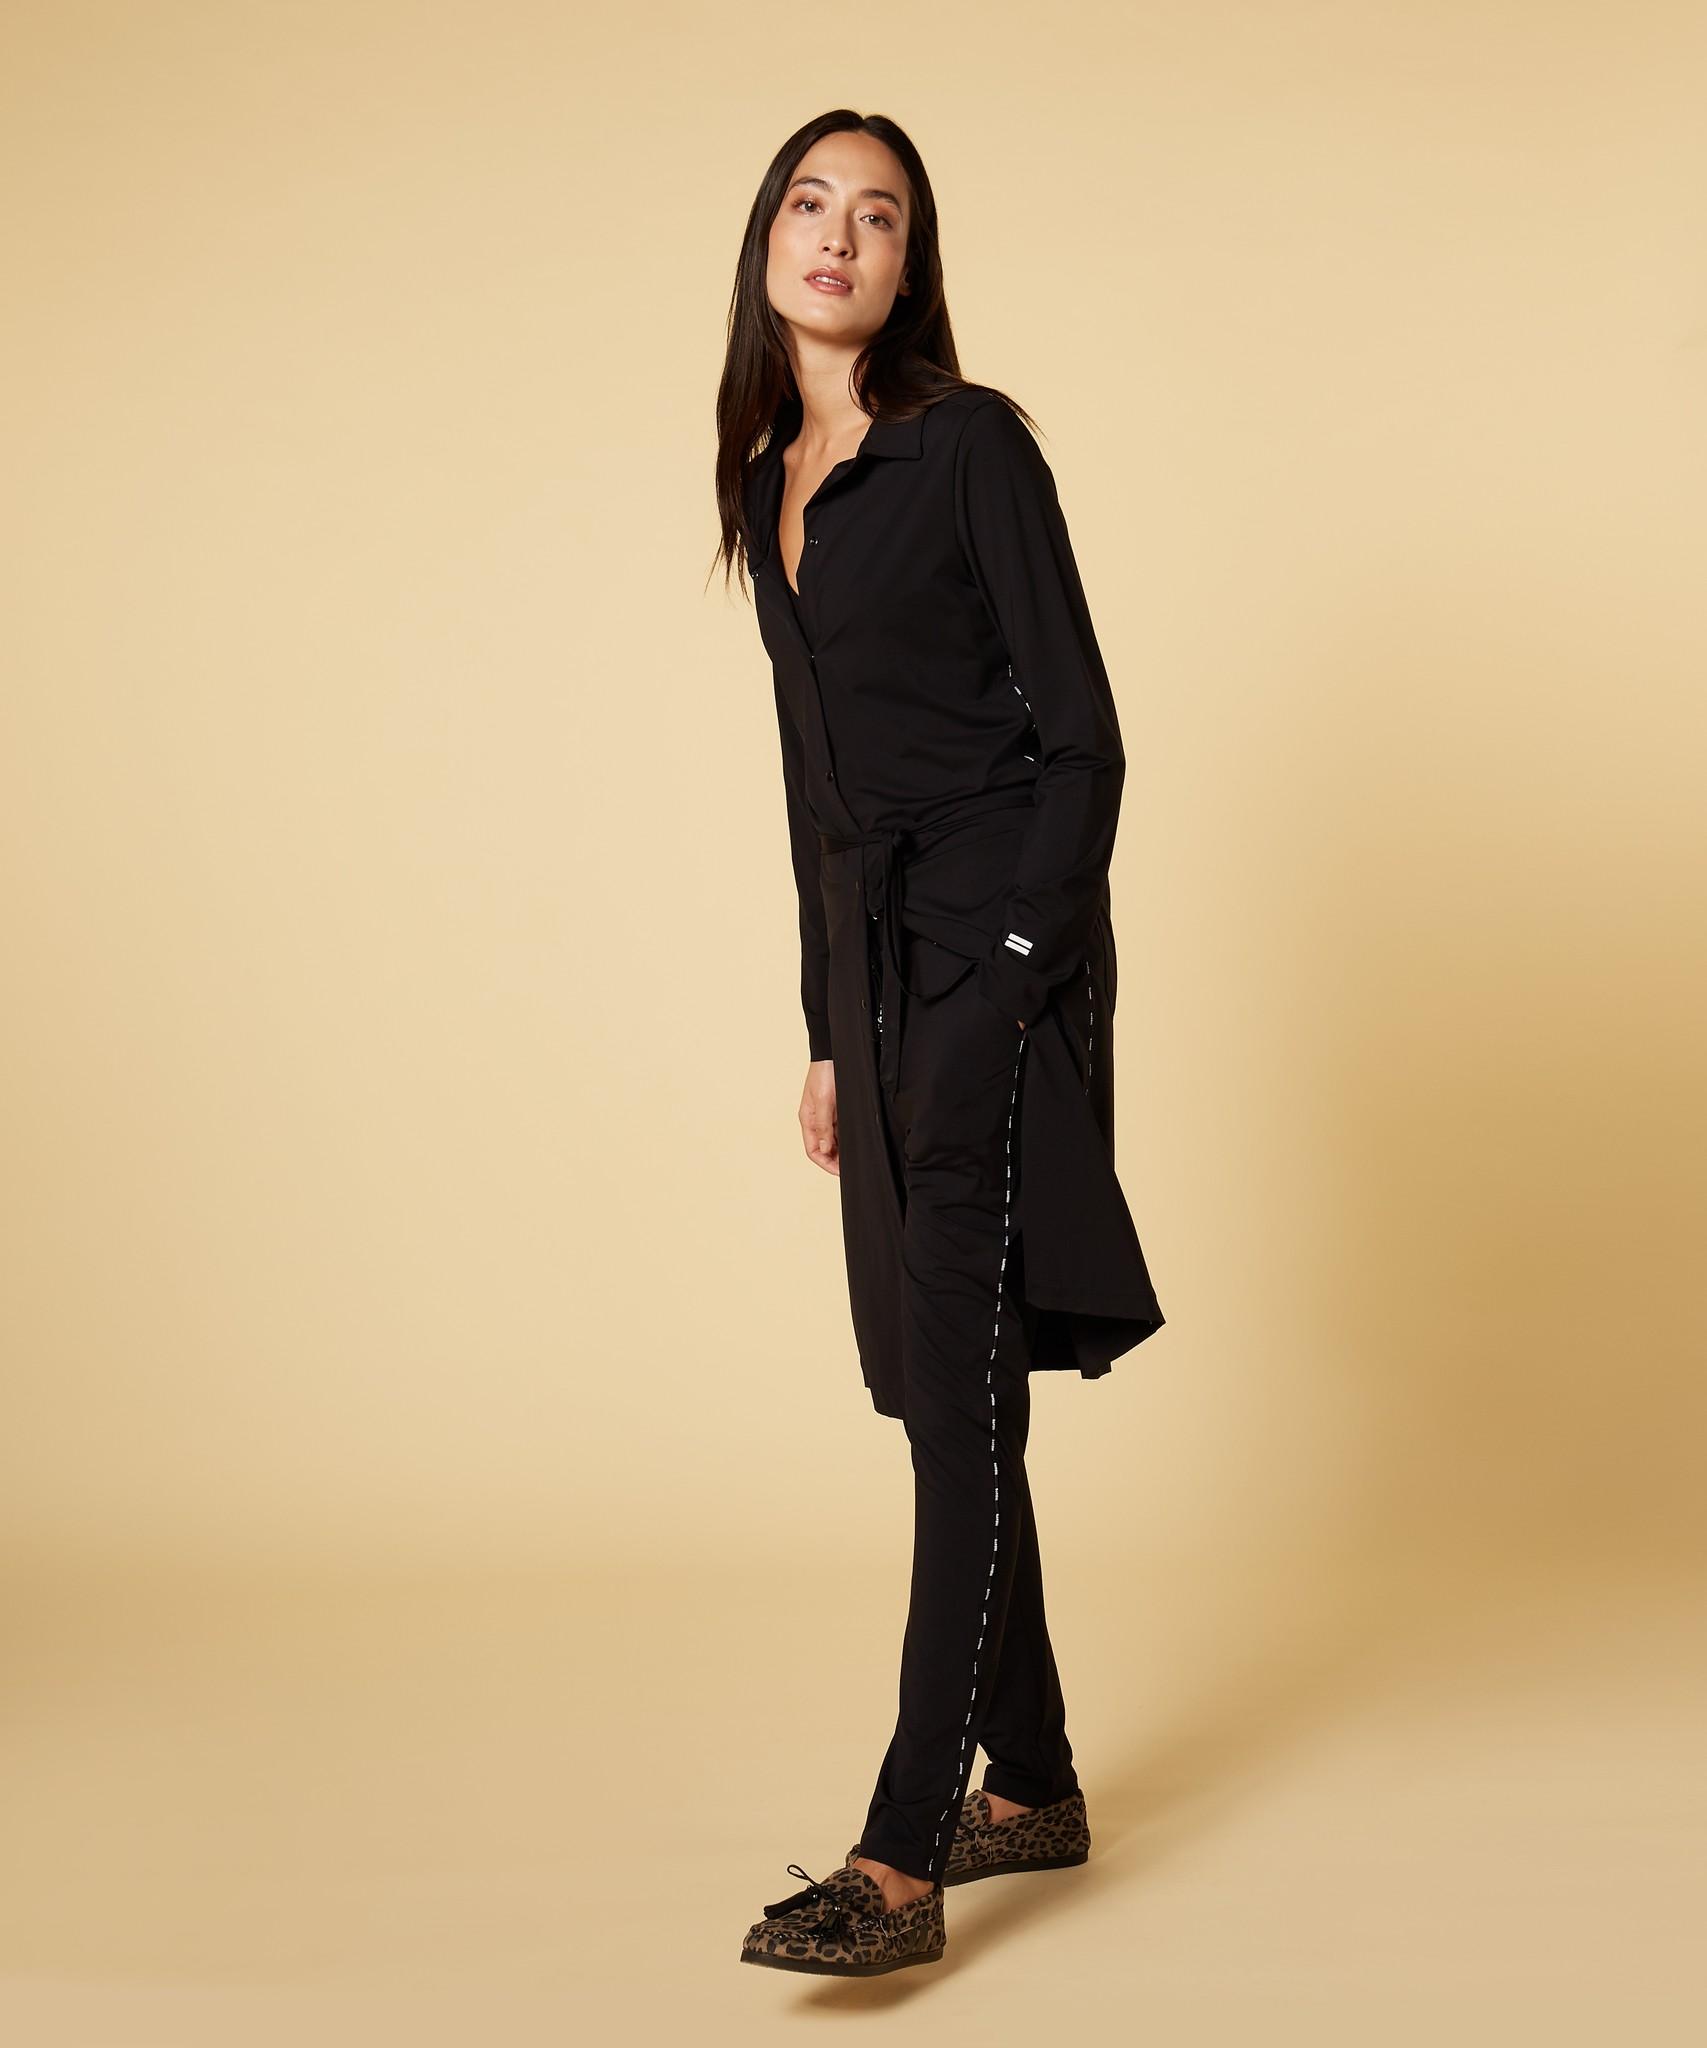 Jurk shirt dress black-4